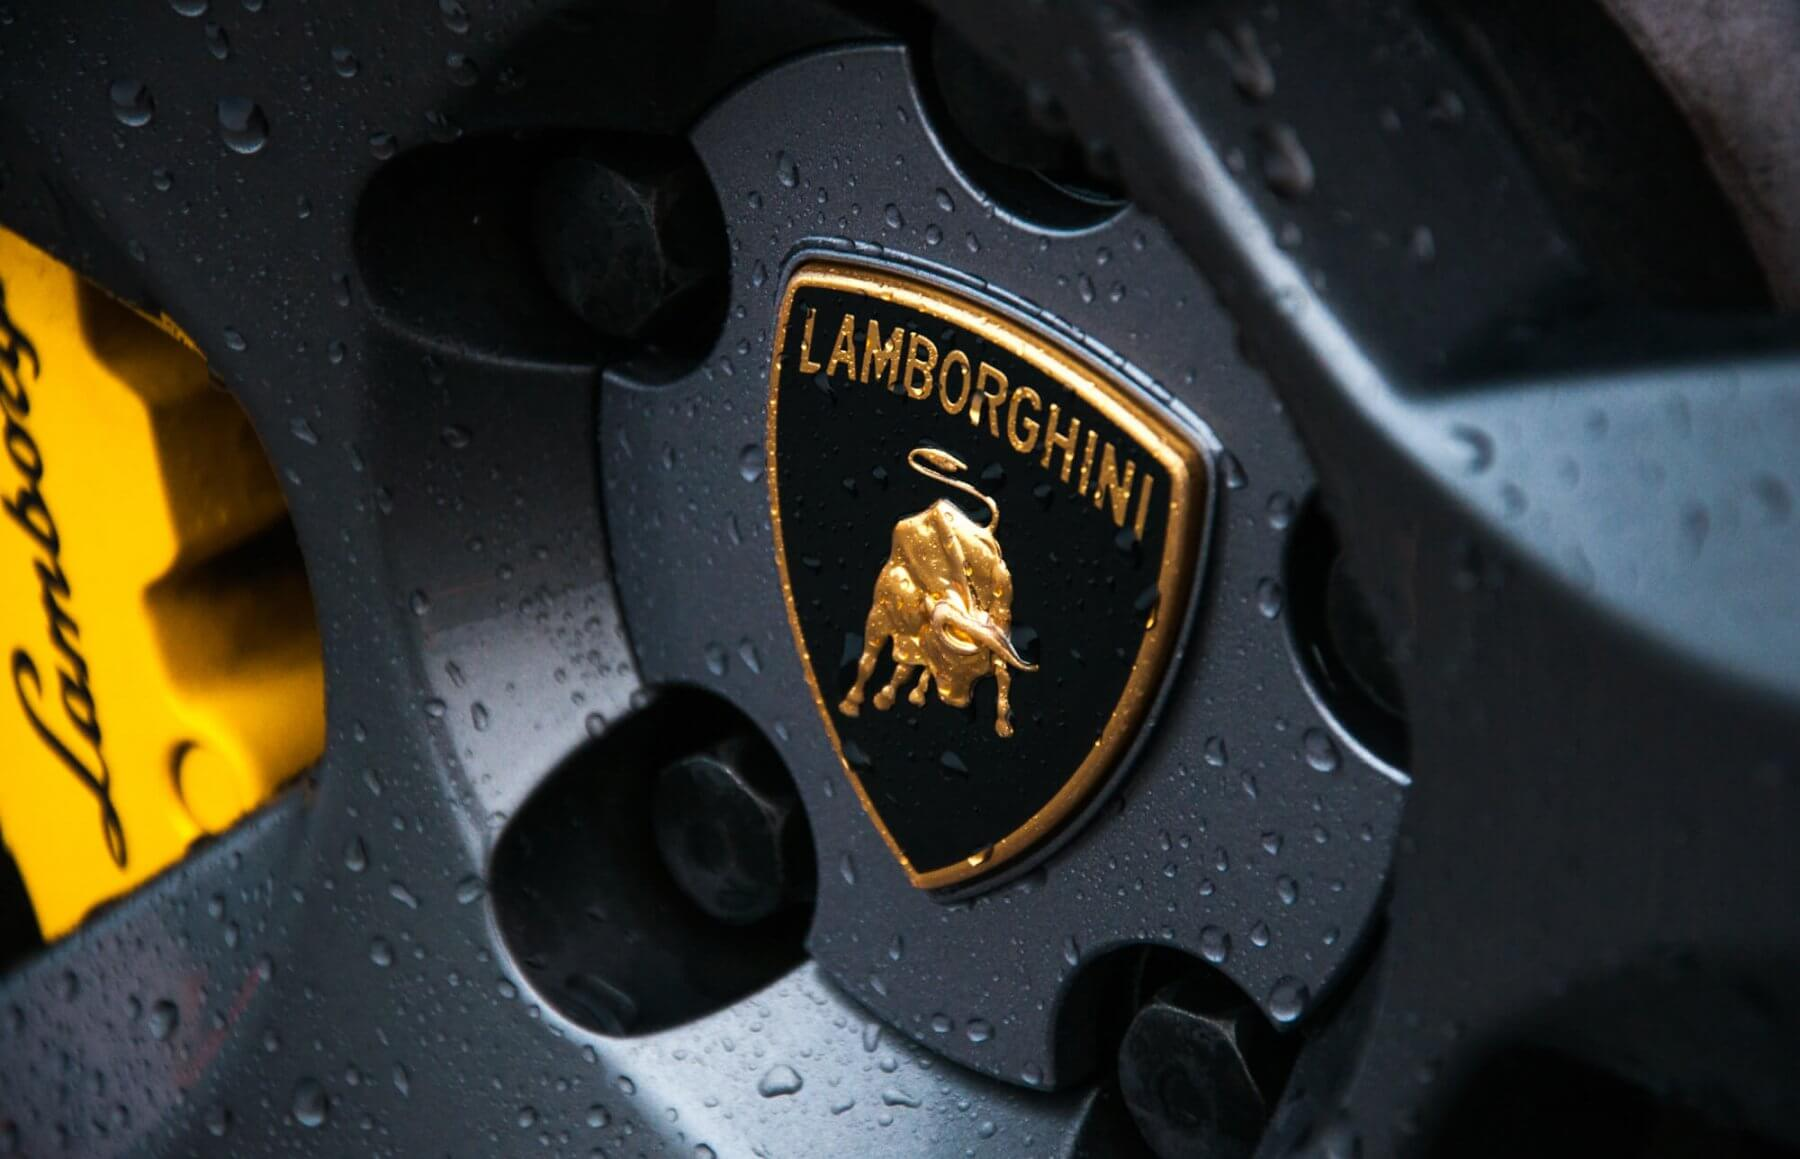 Jazda Lamborghini - poczuj energię